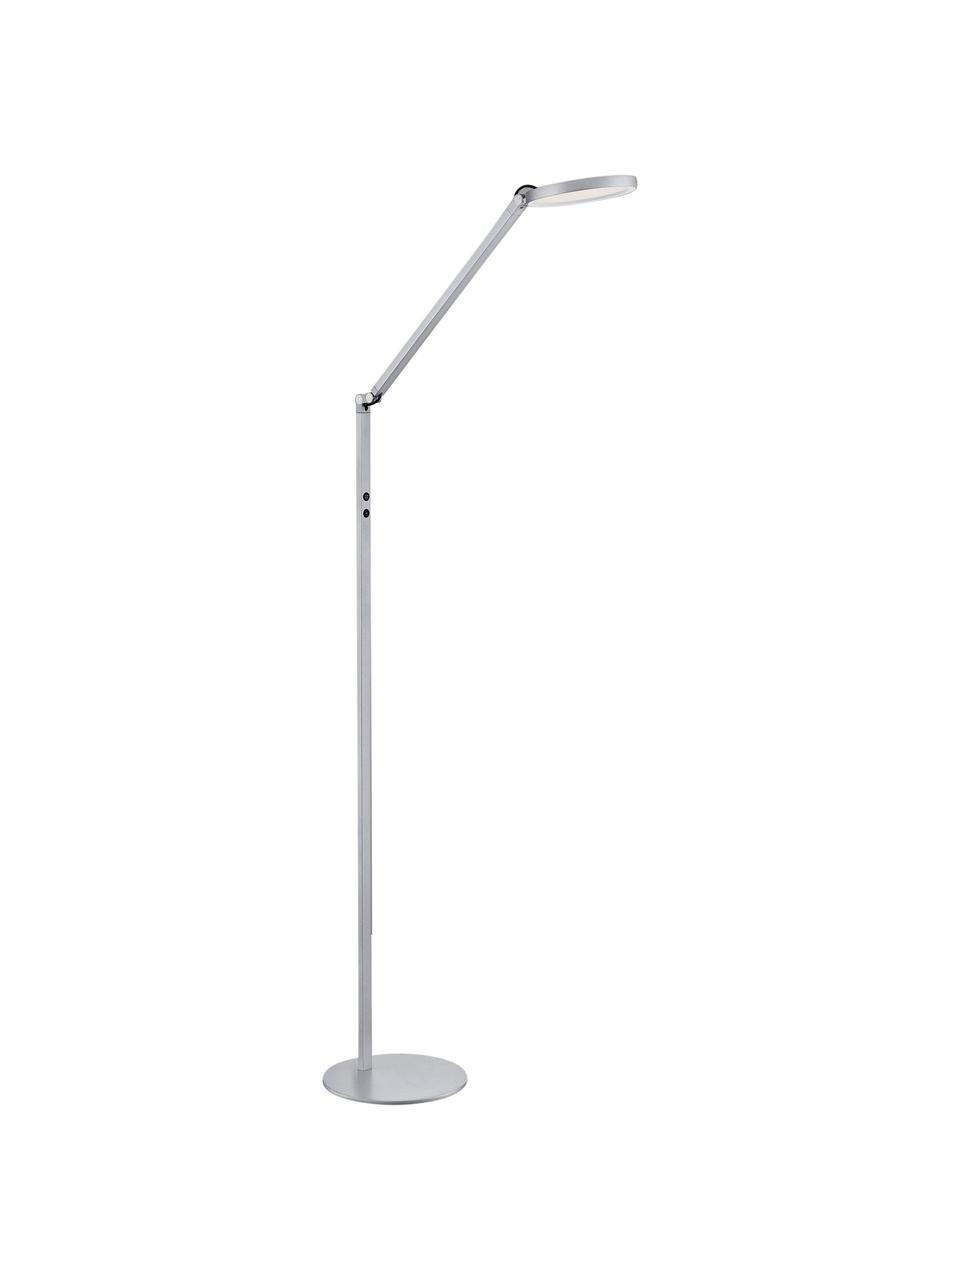 Dimmbare LED-Stehlampe Regina, Lampenschirm: Metall, Methacrylat, Lampenfuß: Metall, Silberfarben, 60 x 160 cm